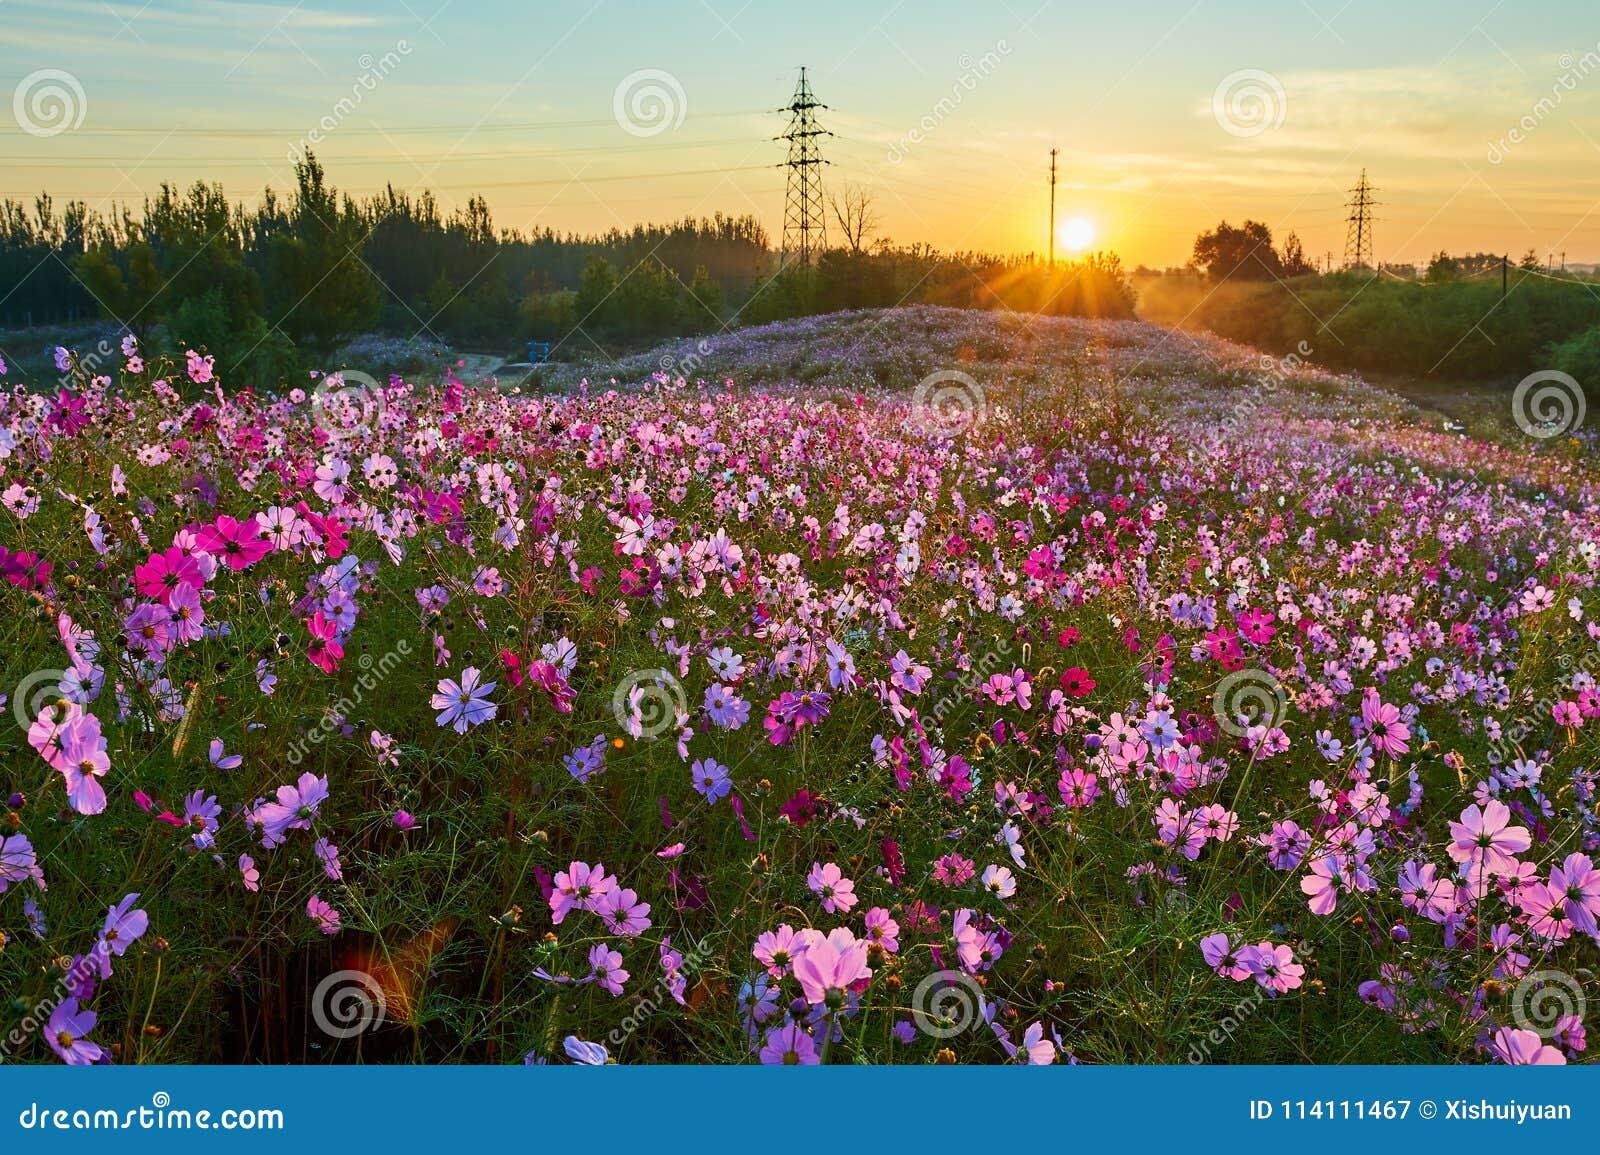 The sea of flowers sunrise stock image. Image of flora - 114111467